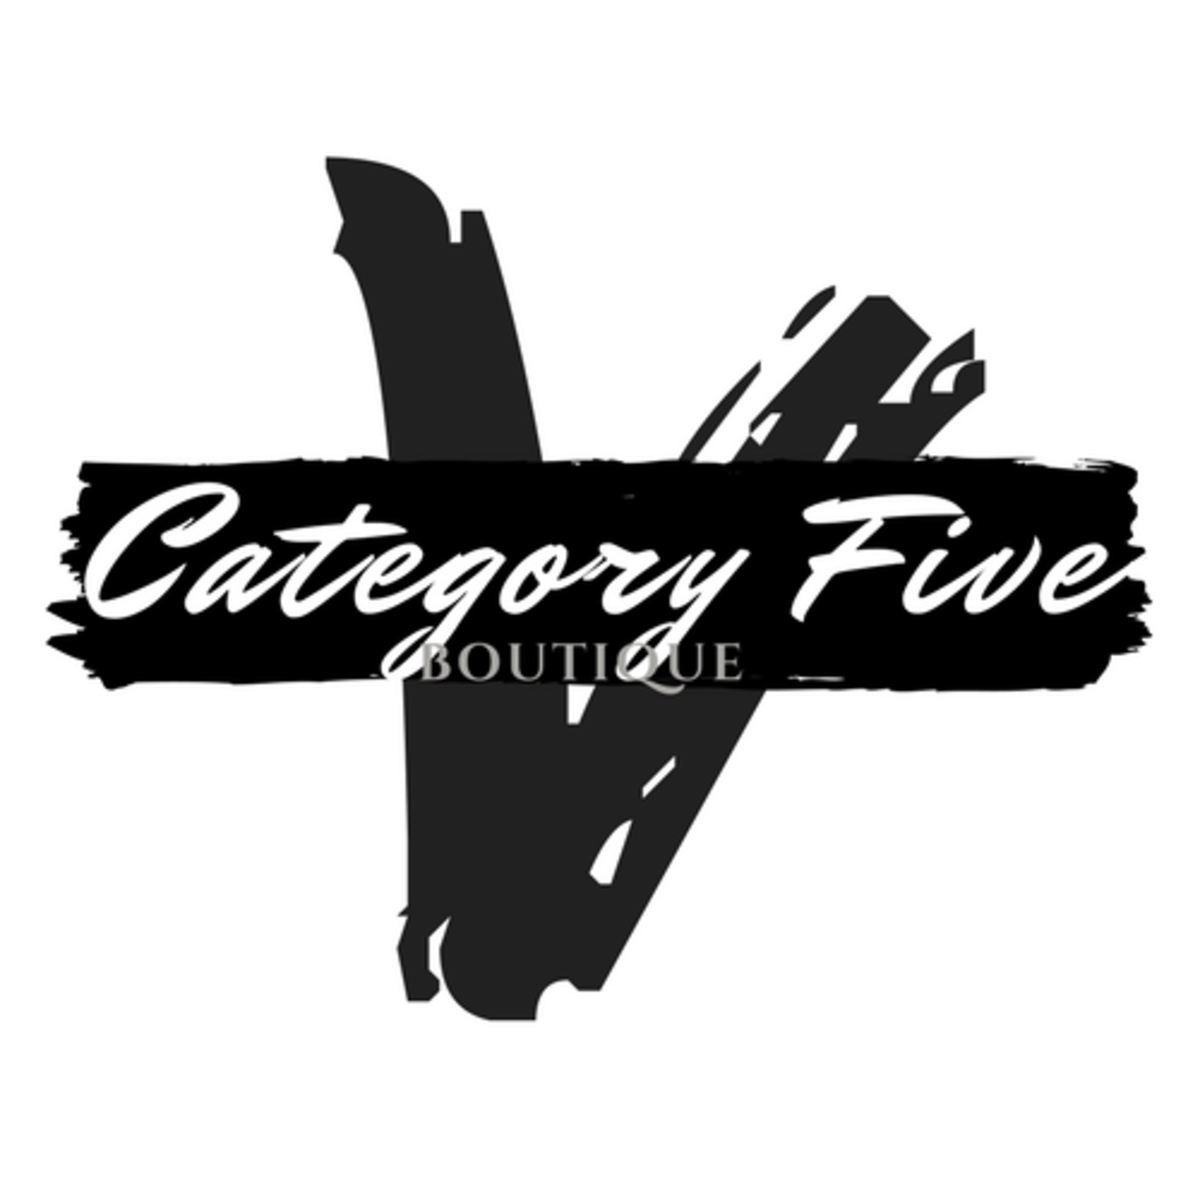 Category Five Boutique Logo